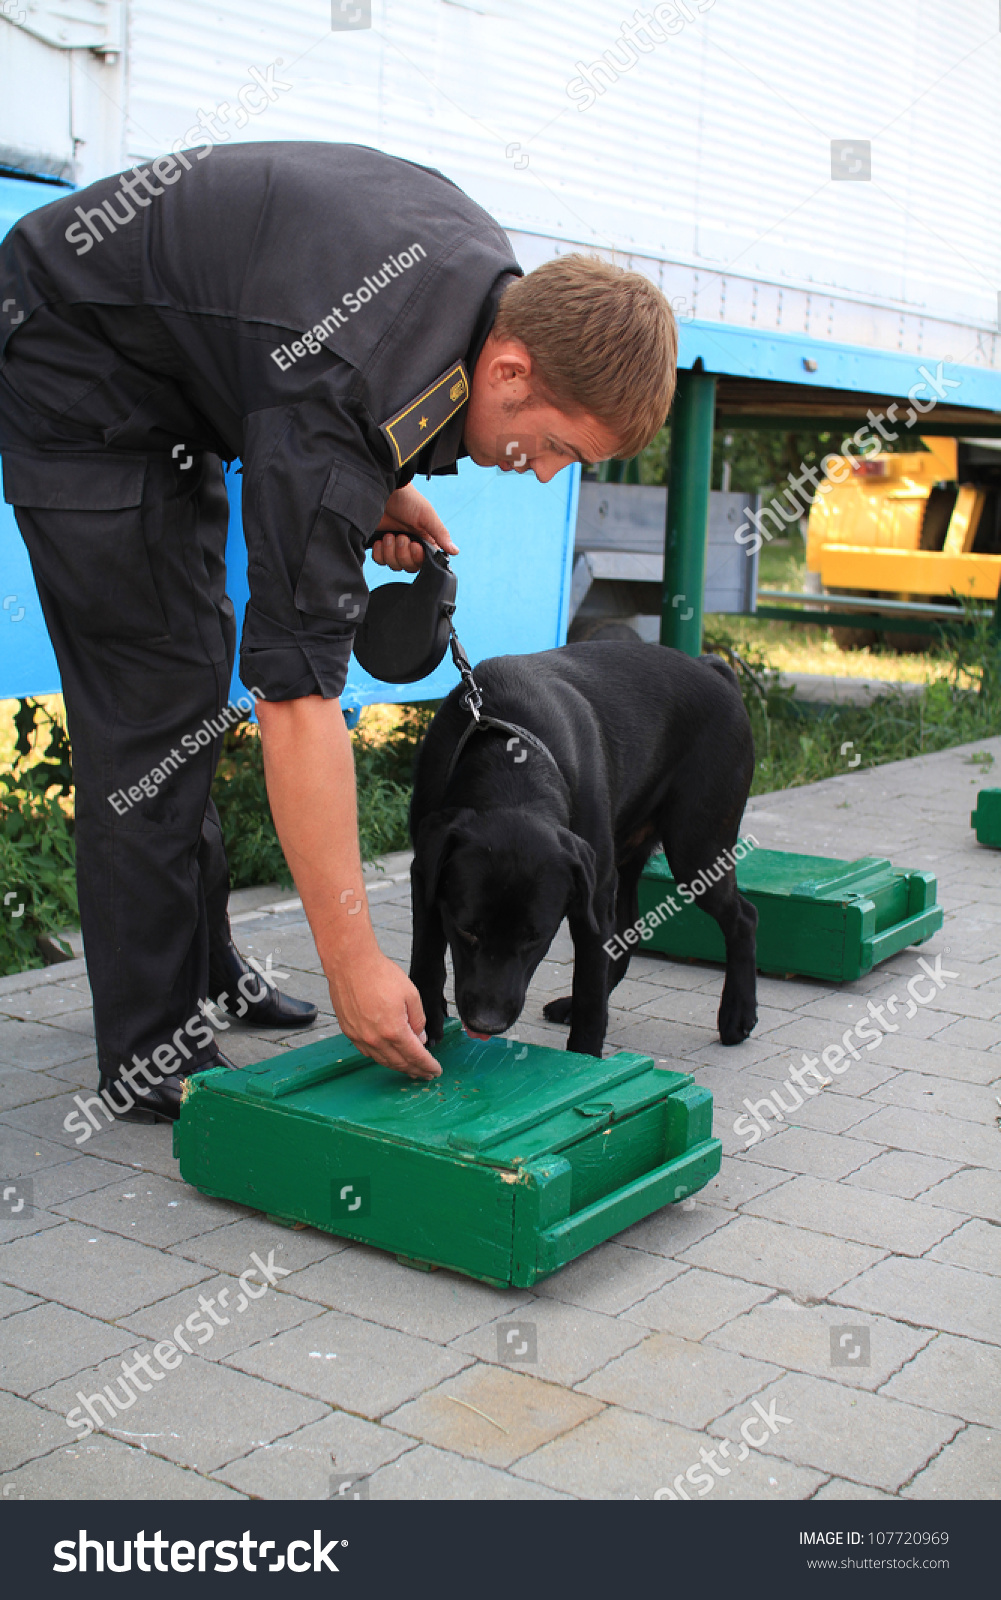 how to become a drug dog handler canada